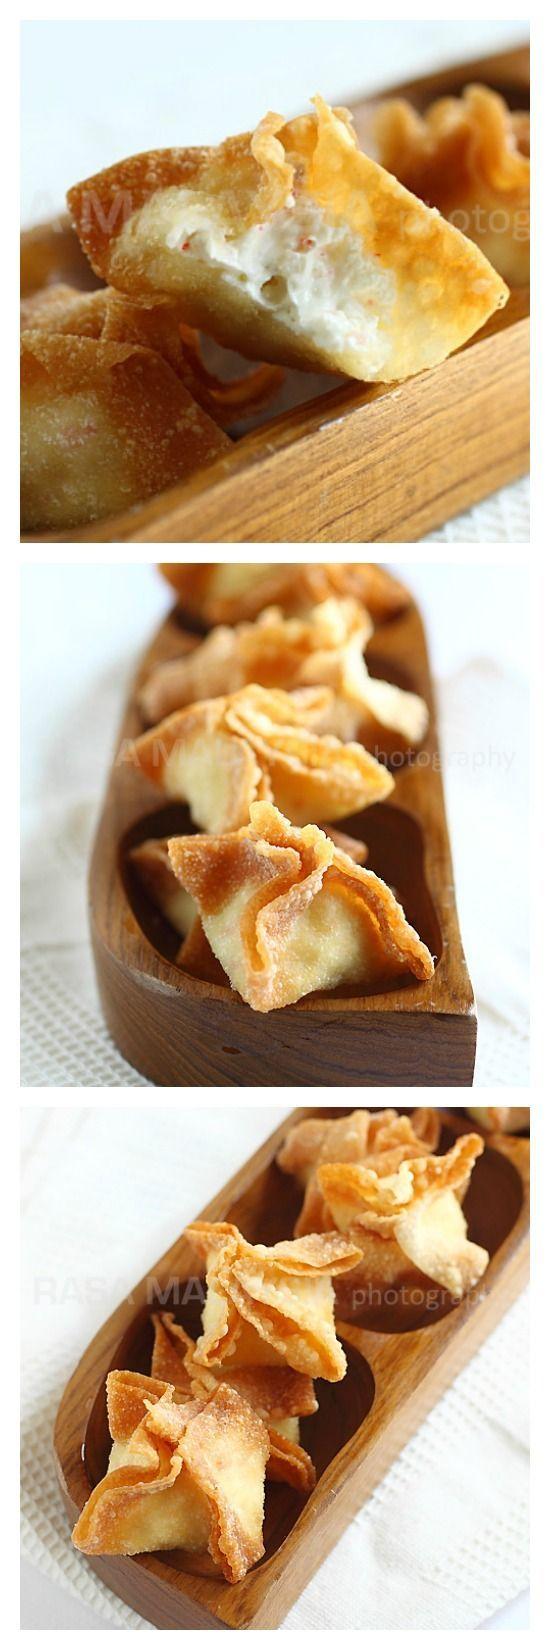 Cream cheese wontons or crab Rangoon. 3 ingredients, super fast, easy, and yummy | rasamalaysia.com